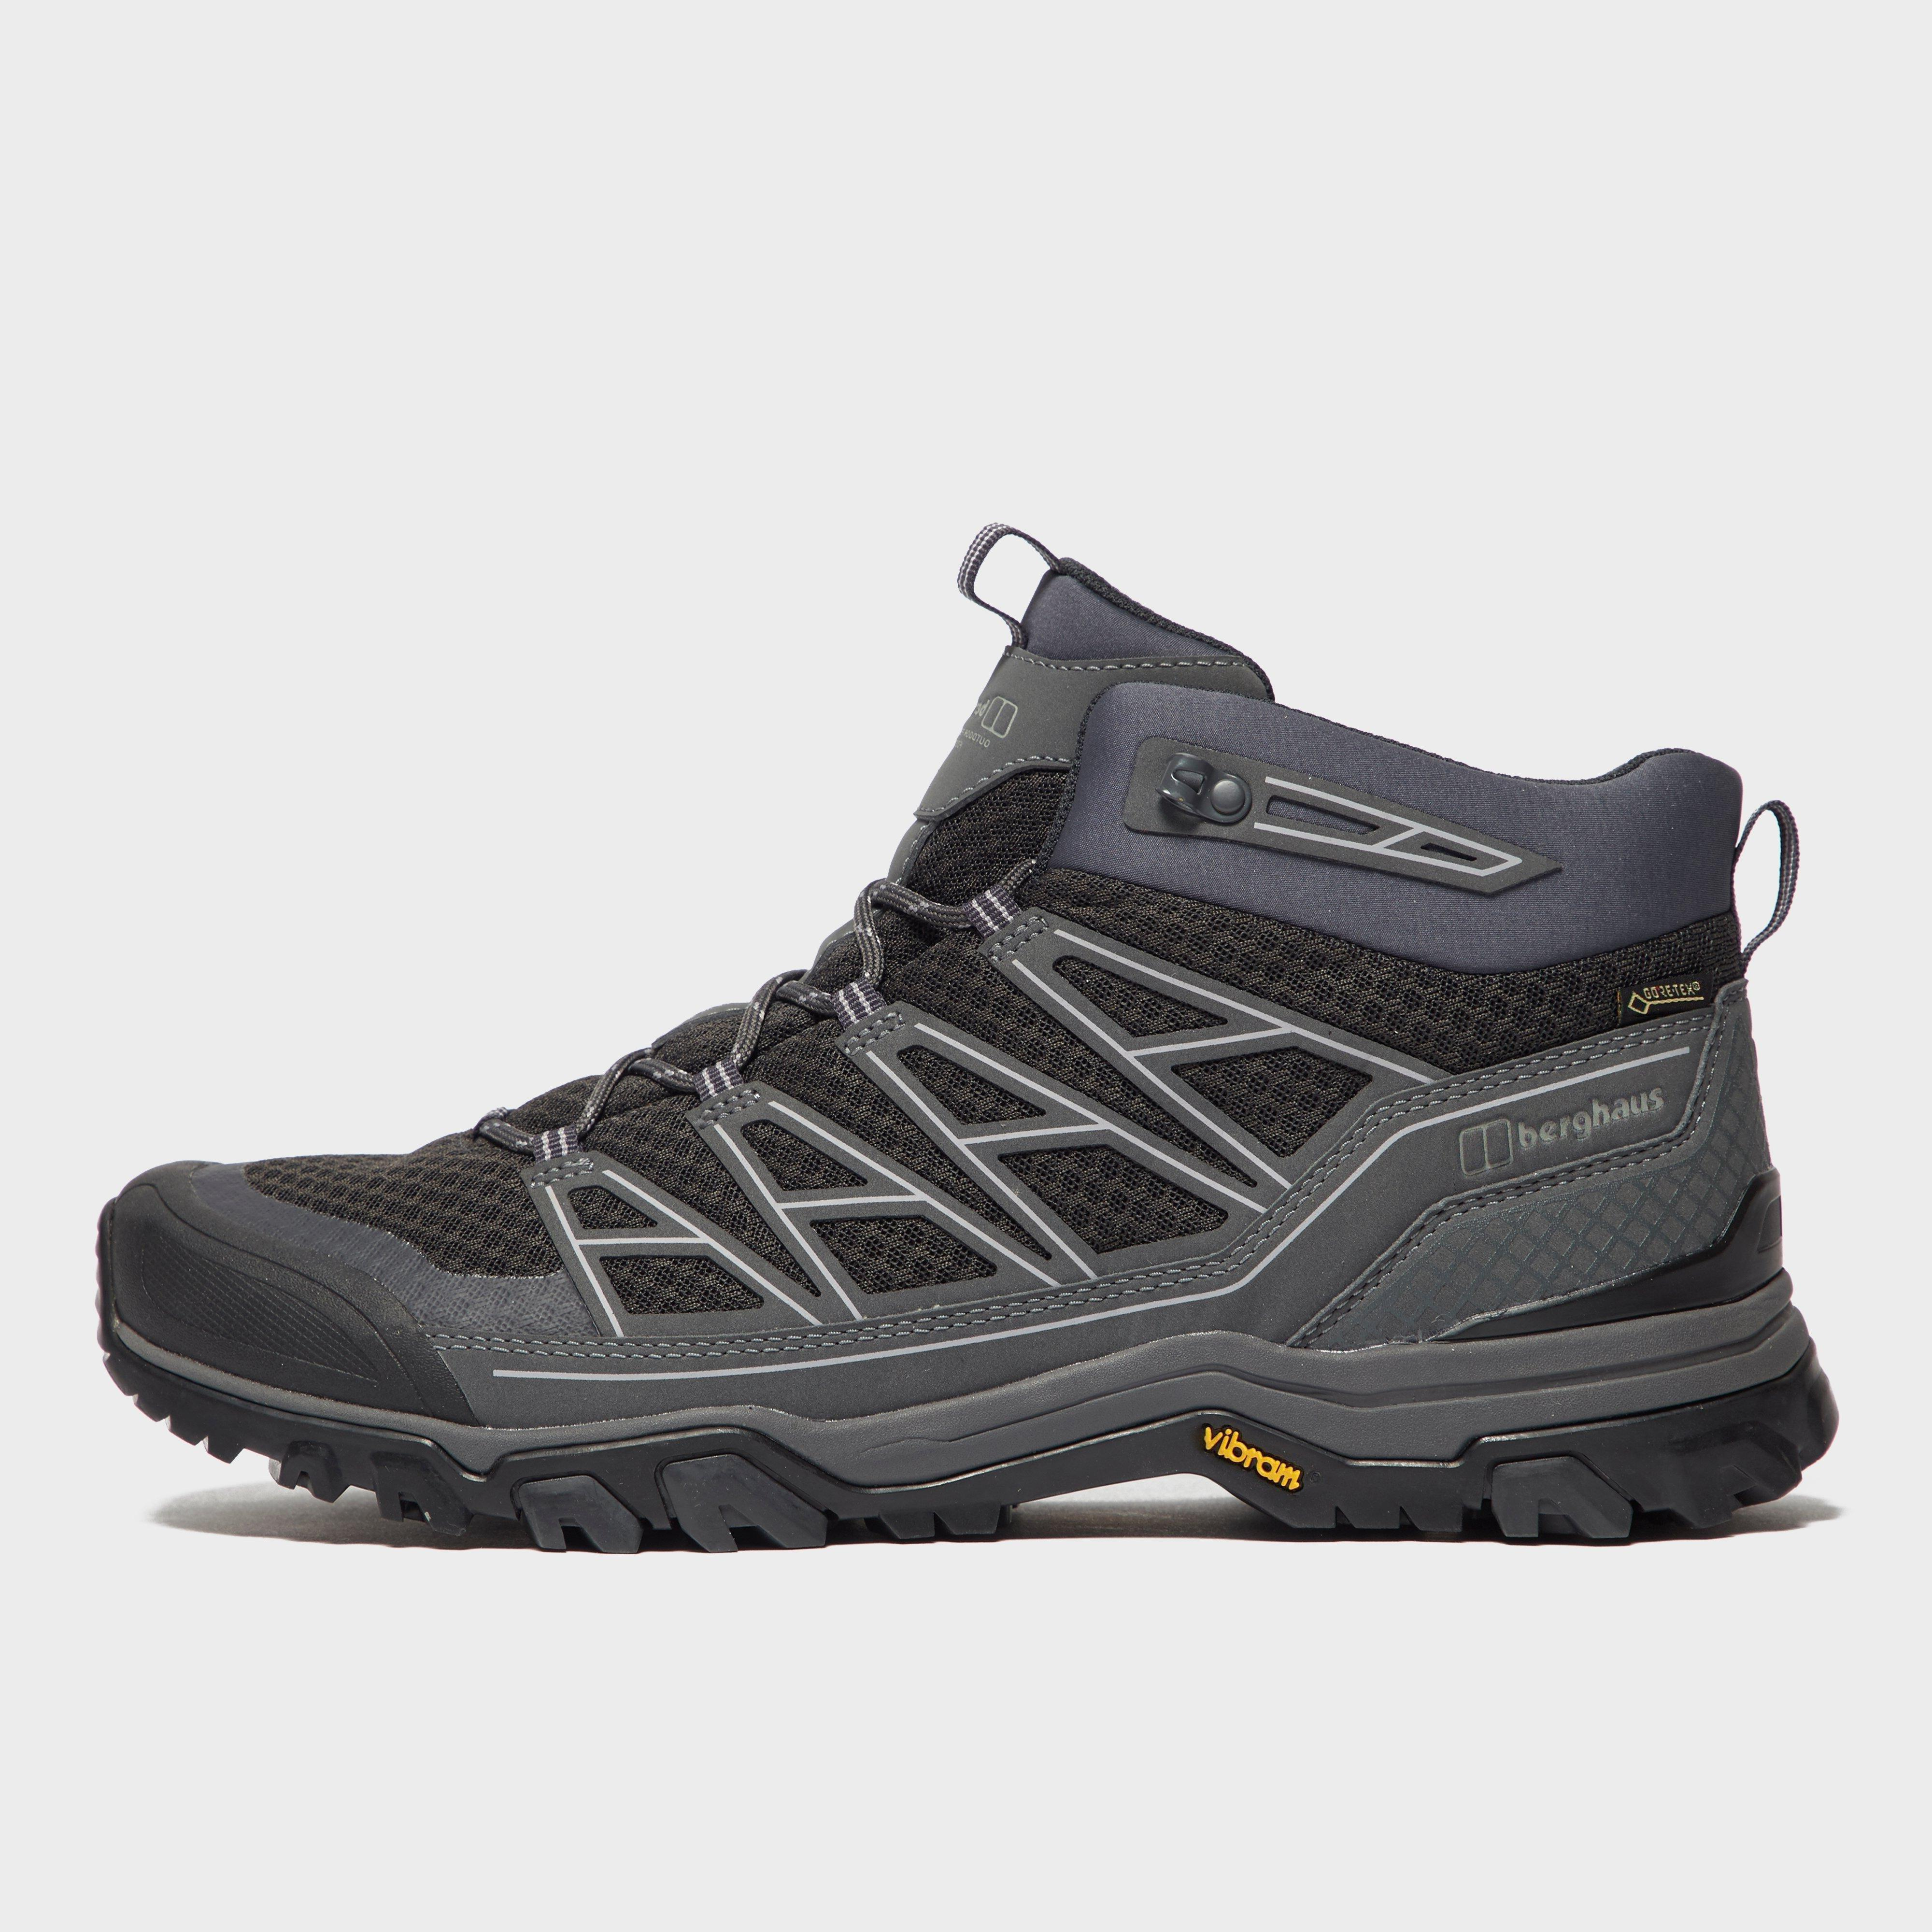 93e723ae BERGHAUS Men's Expanse Mid GORE-TEX® Walking Boots image 1